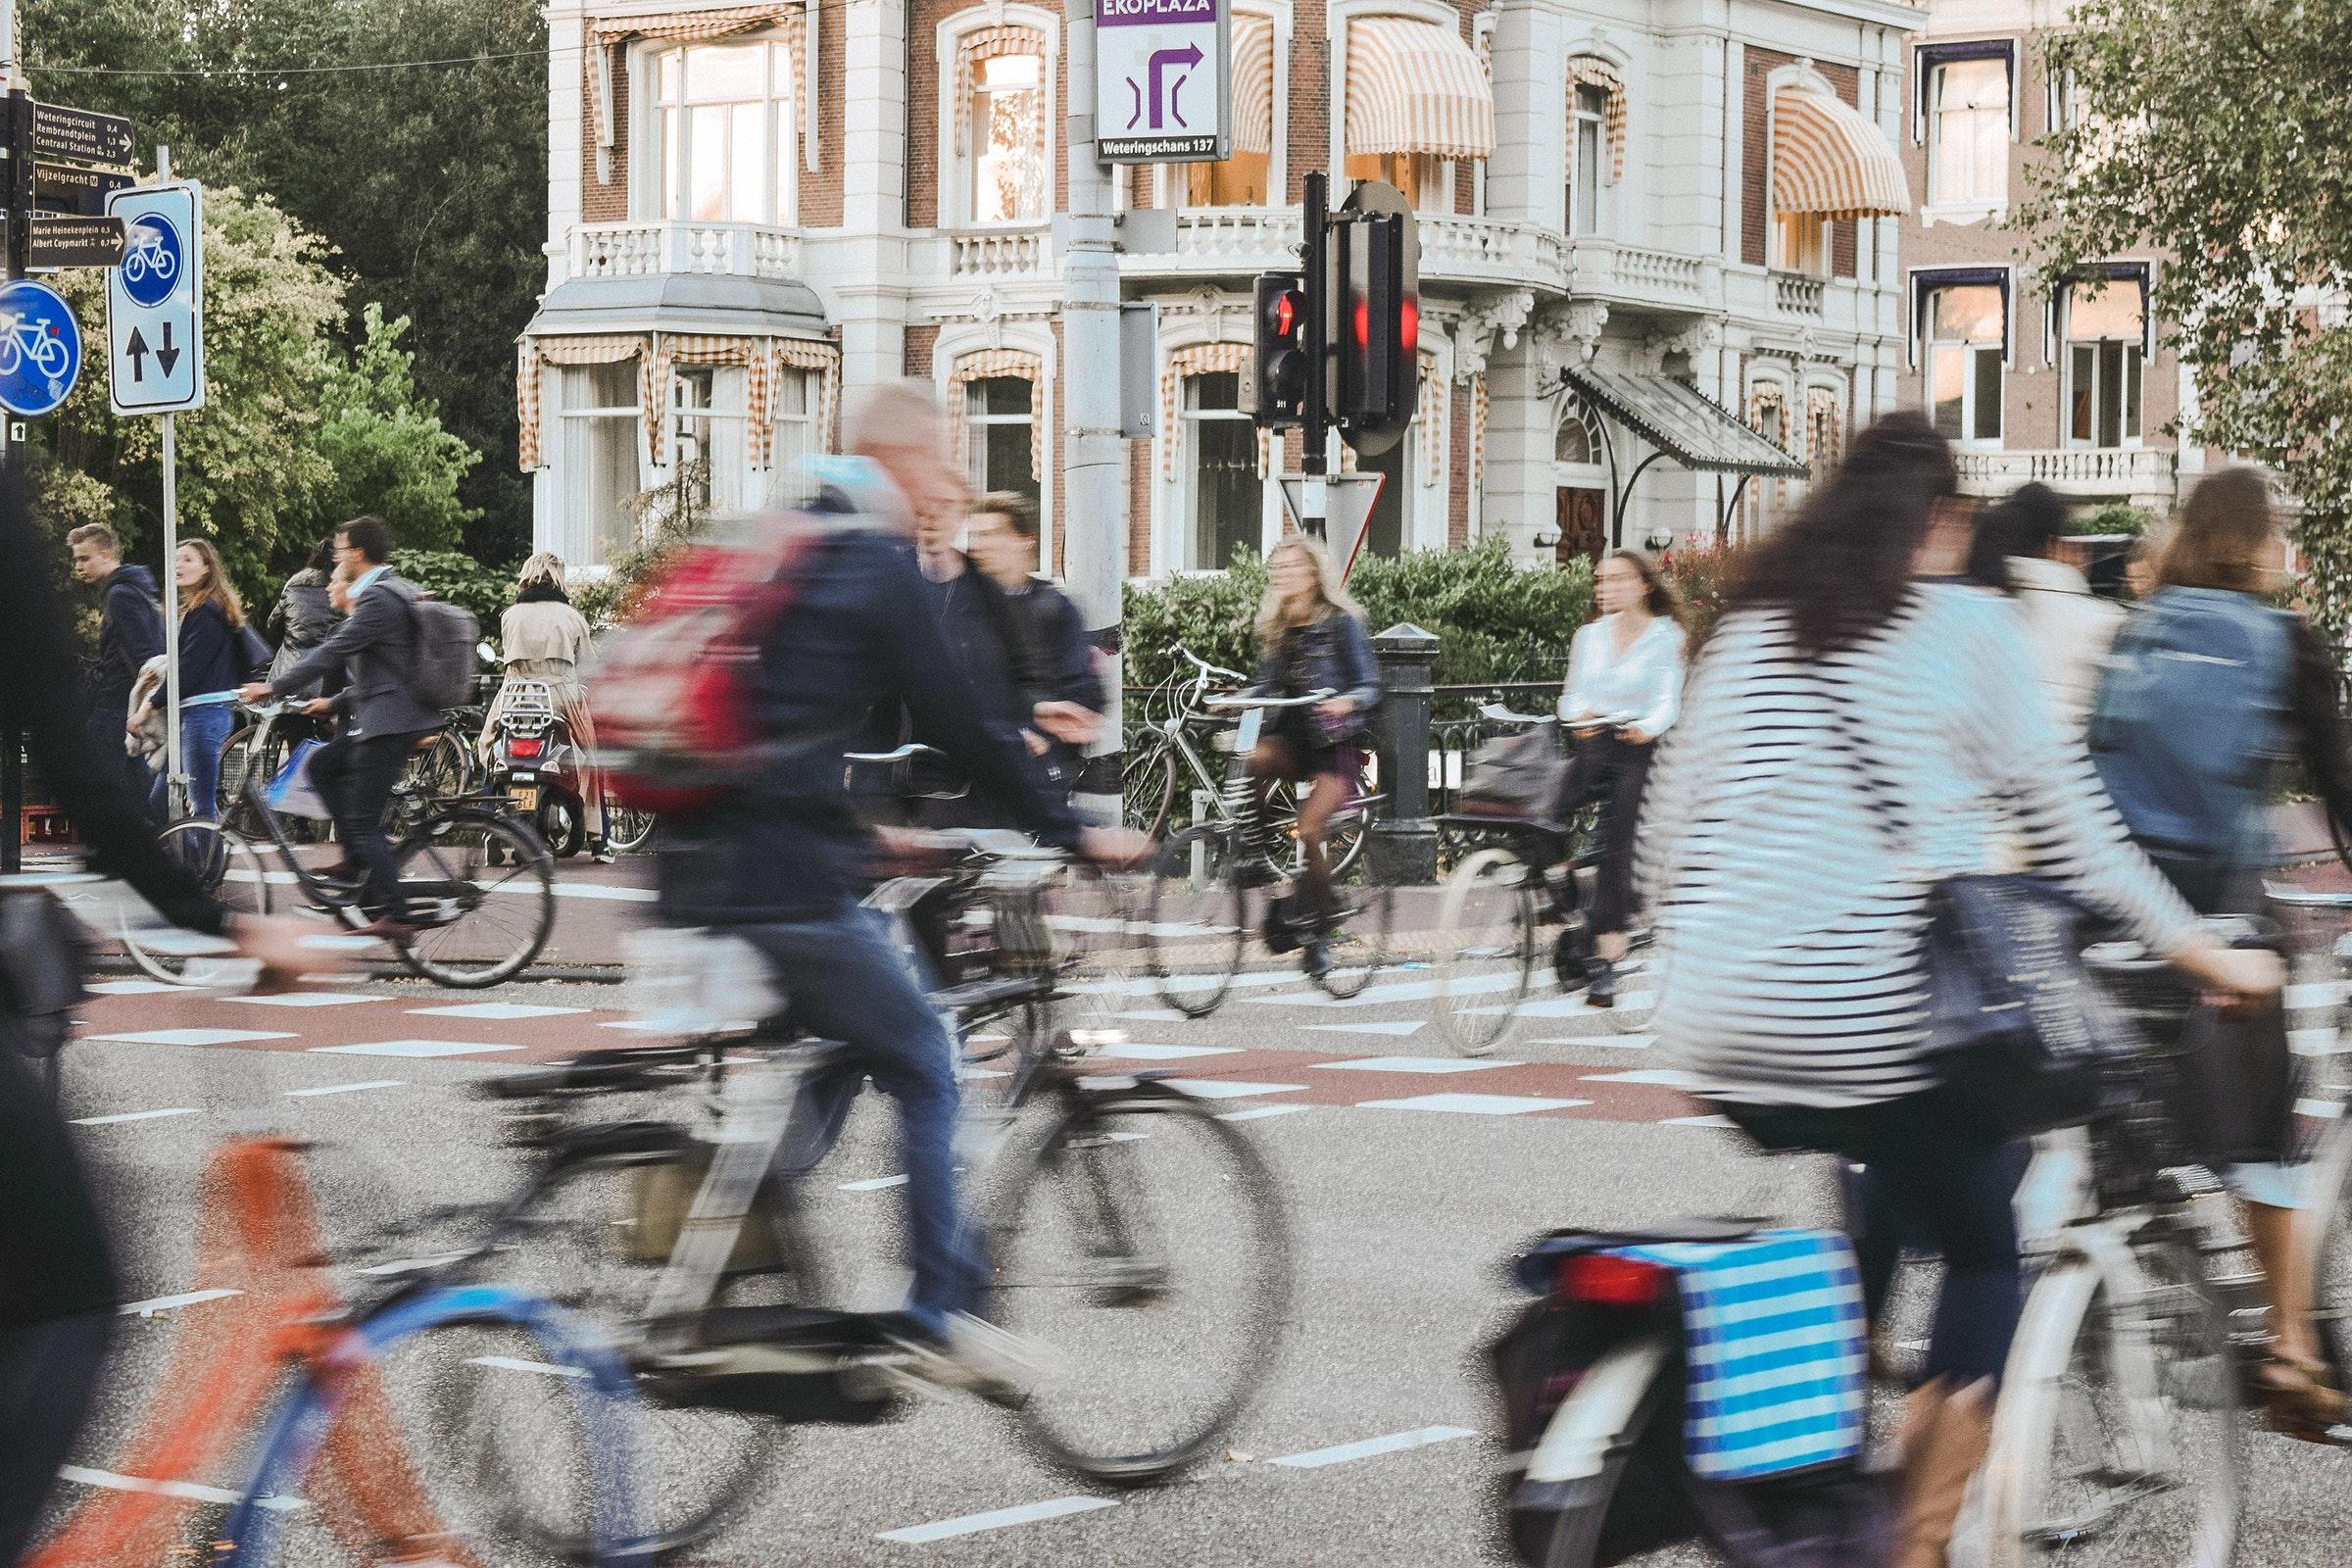 Fietsers op een kruispunt in Amsterdam